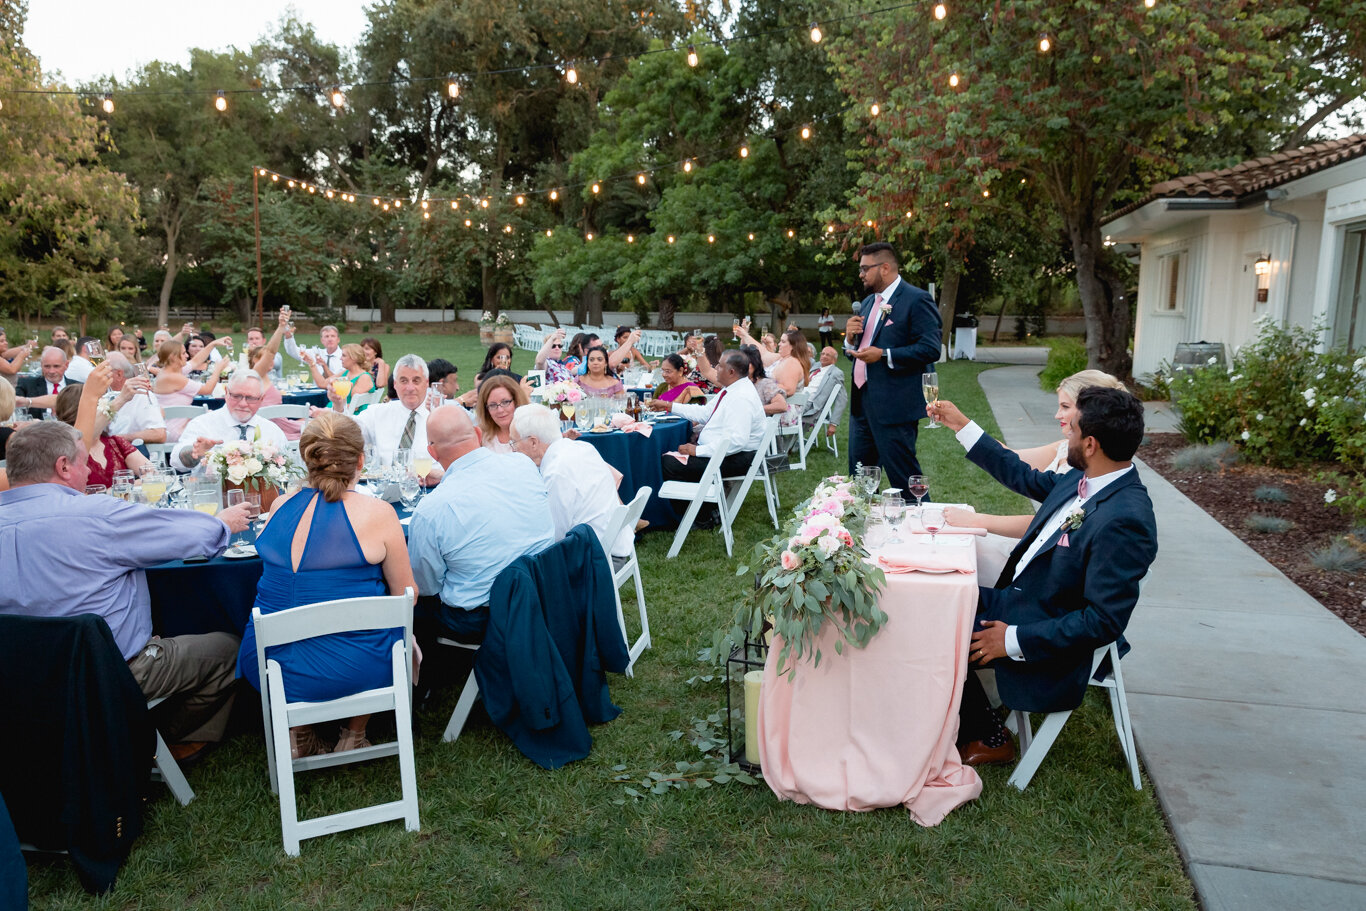 2019.08.24_Emily-Ashir-Wedding-at-the-Maples-6291.jpg